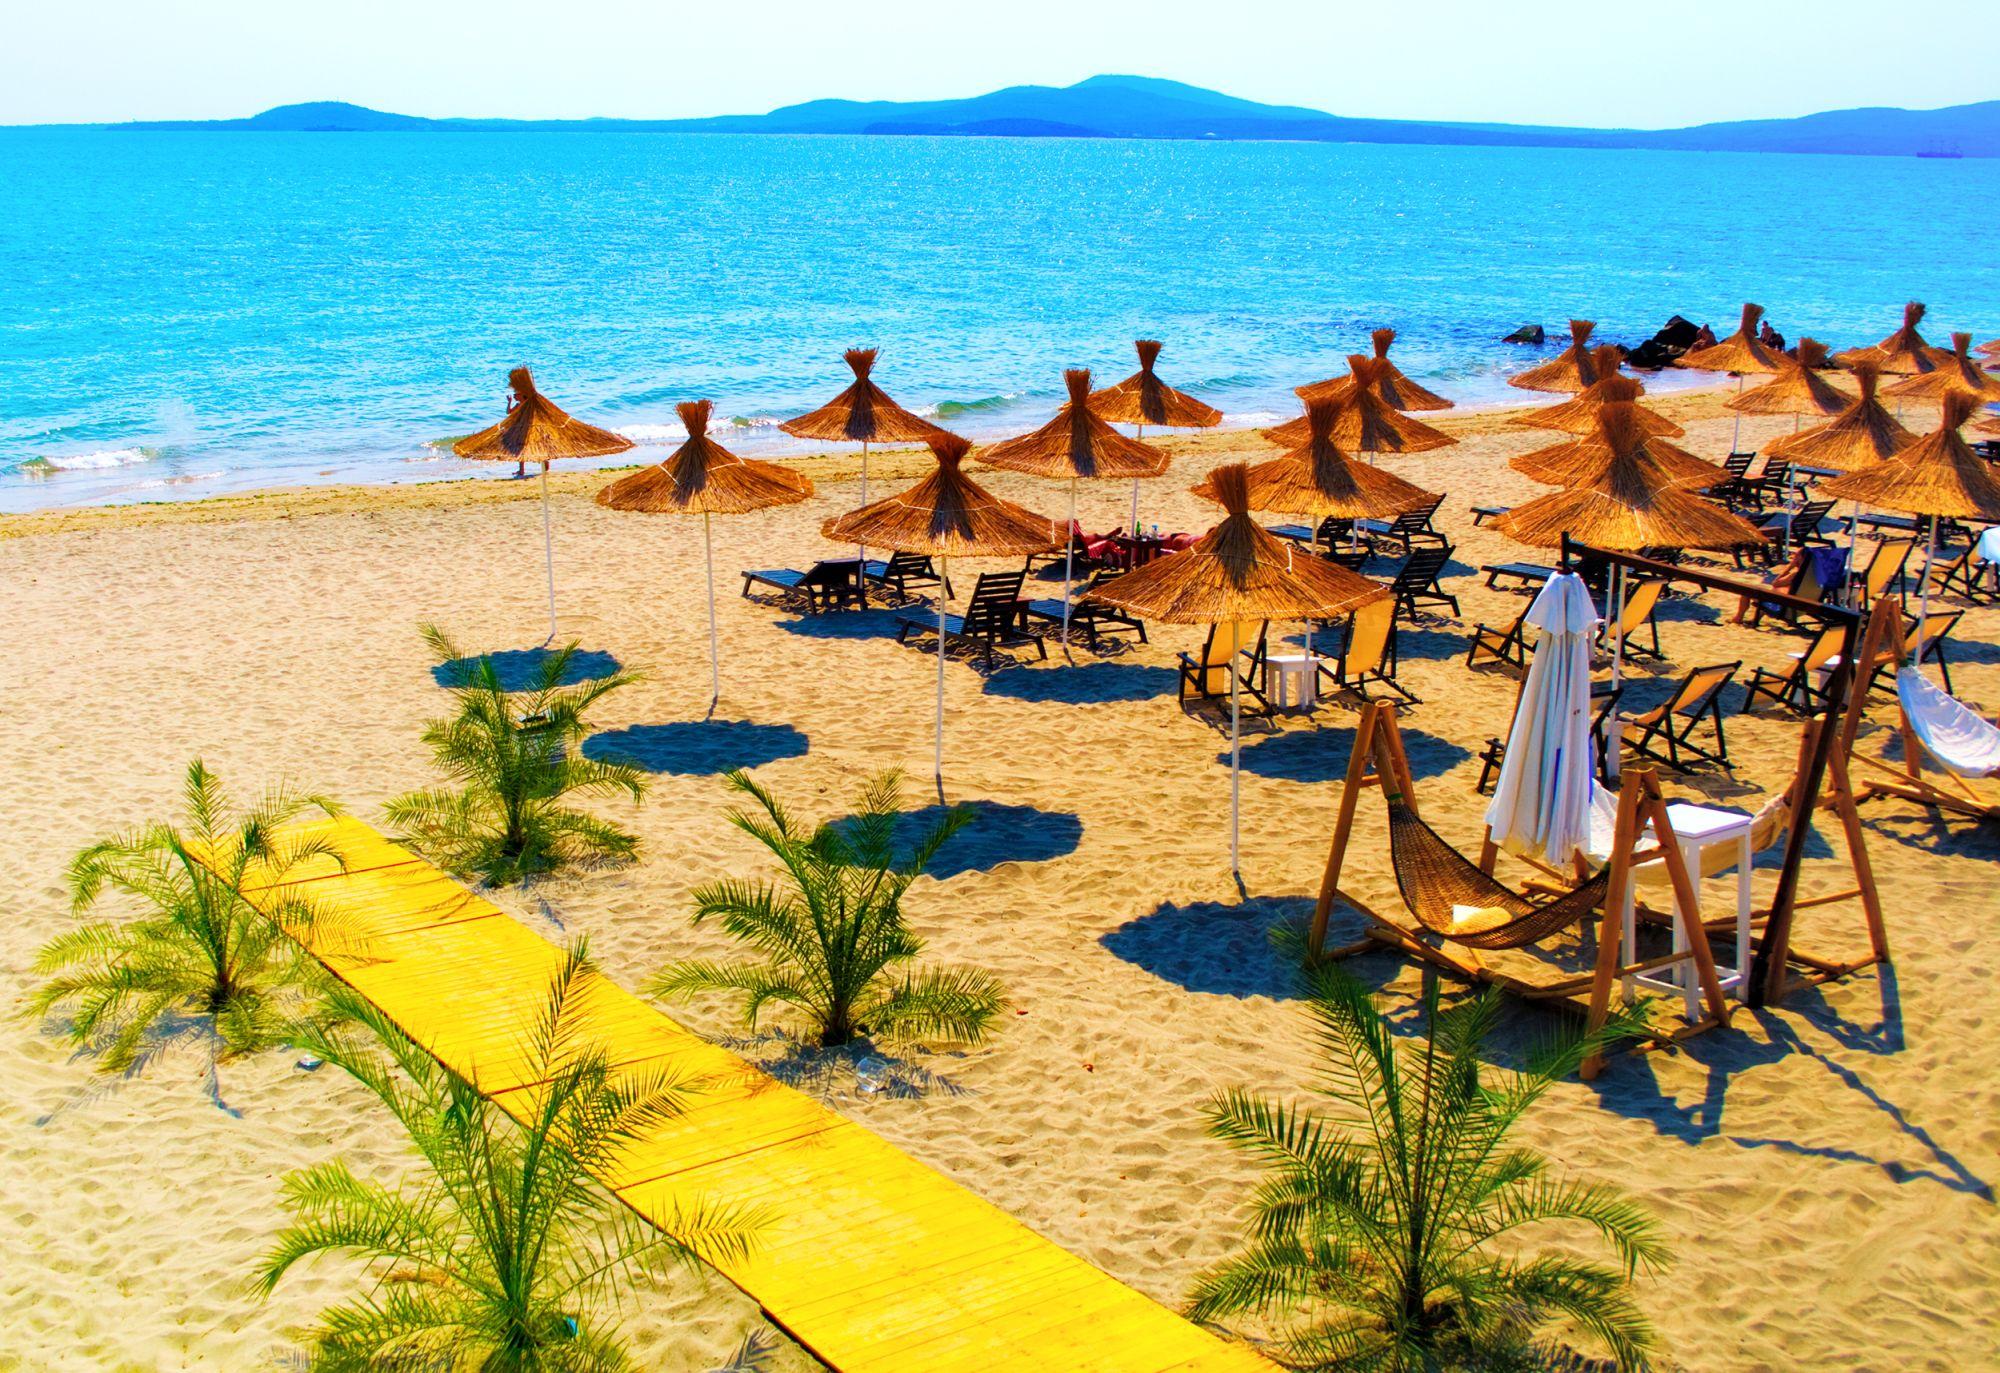 Bułgaria widok plaży